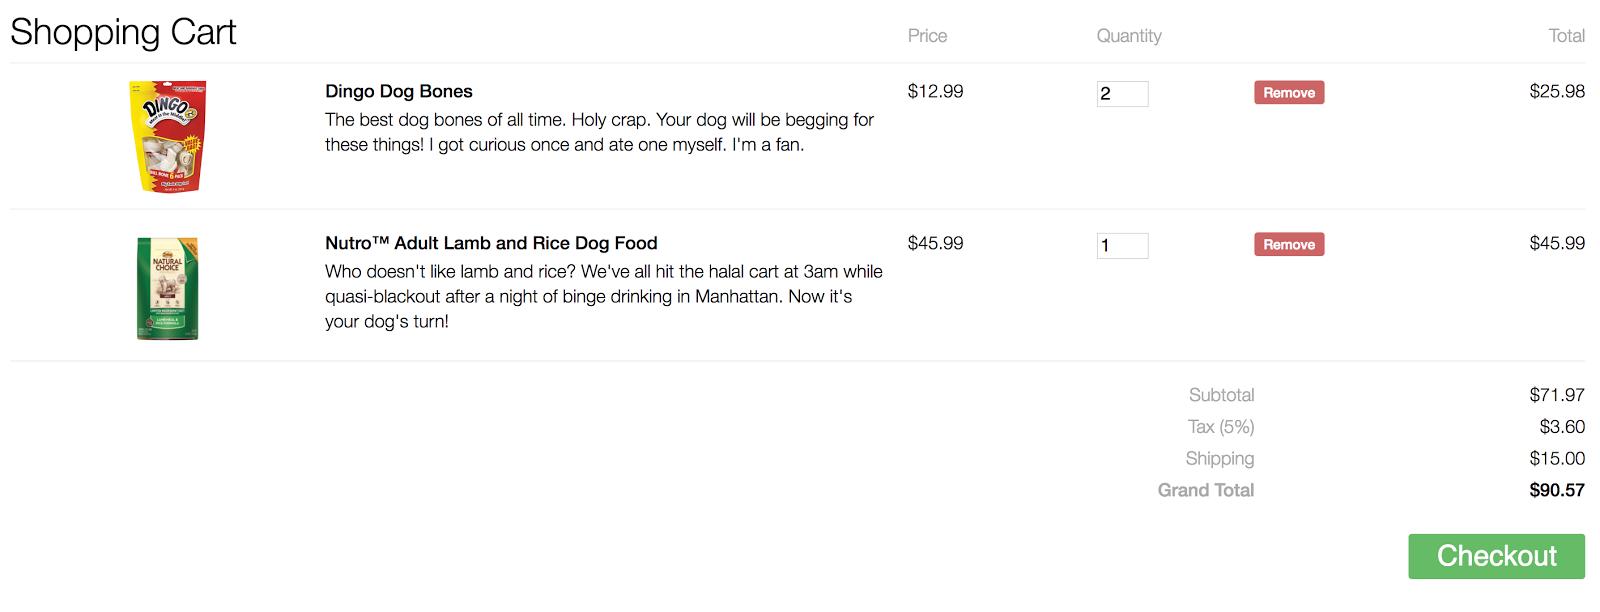 Responsive Shopping Cart UI